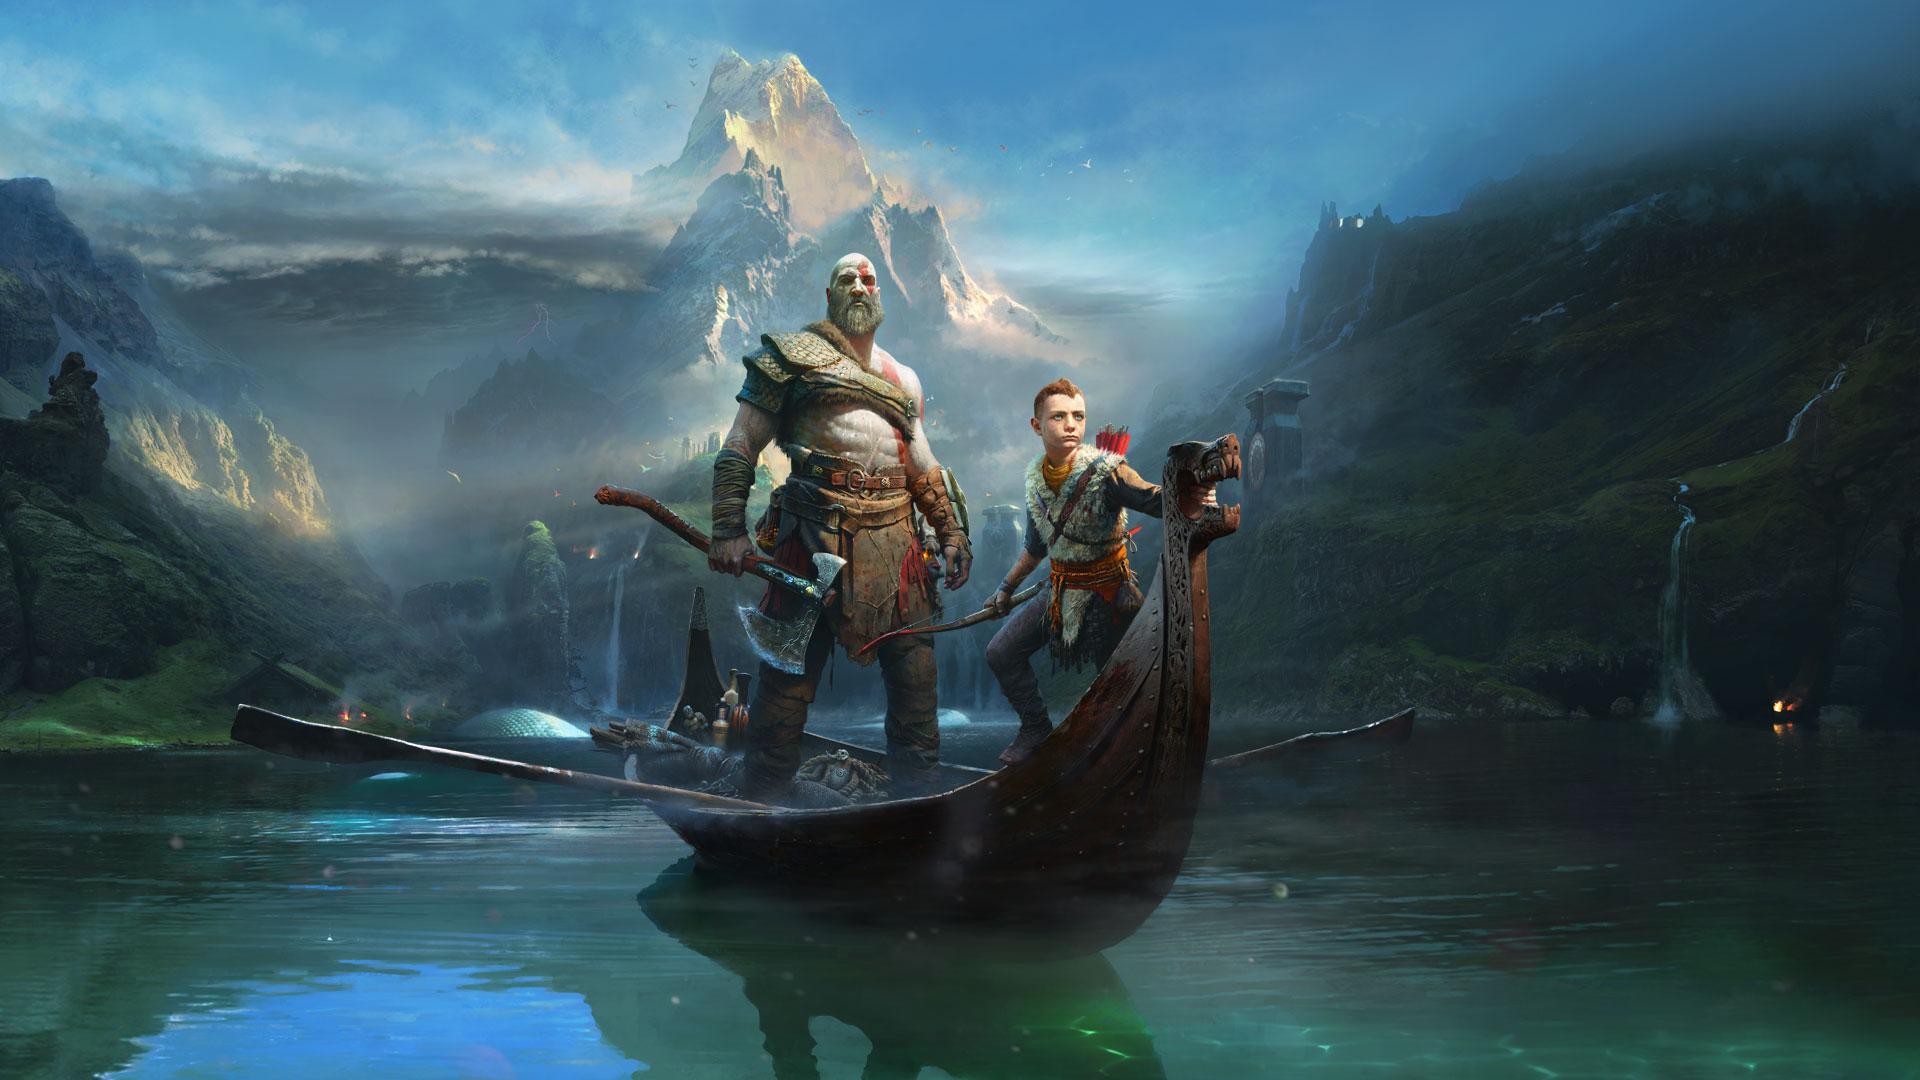 Wallpaper Kratos, God of war, boat, river, game